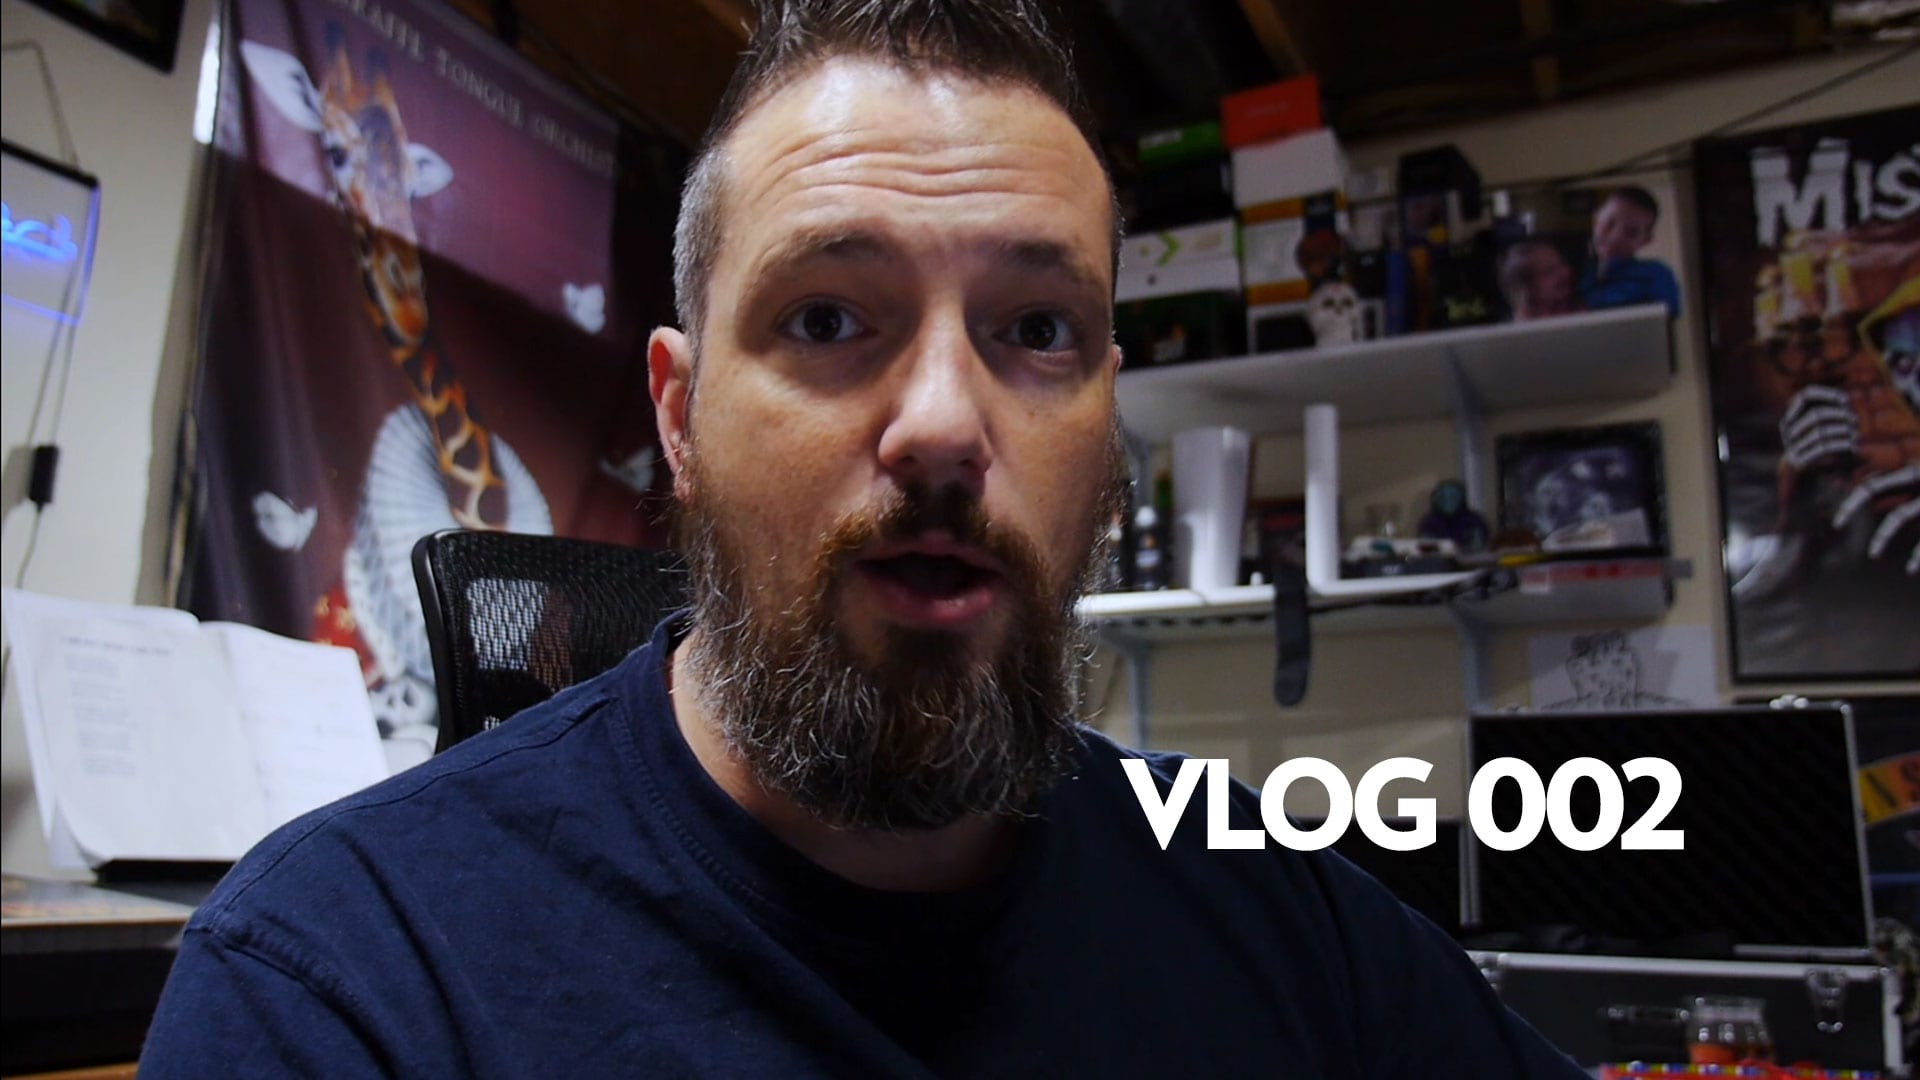 Vlog 002: More Stuff